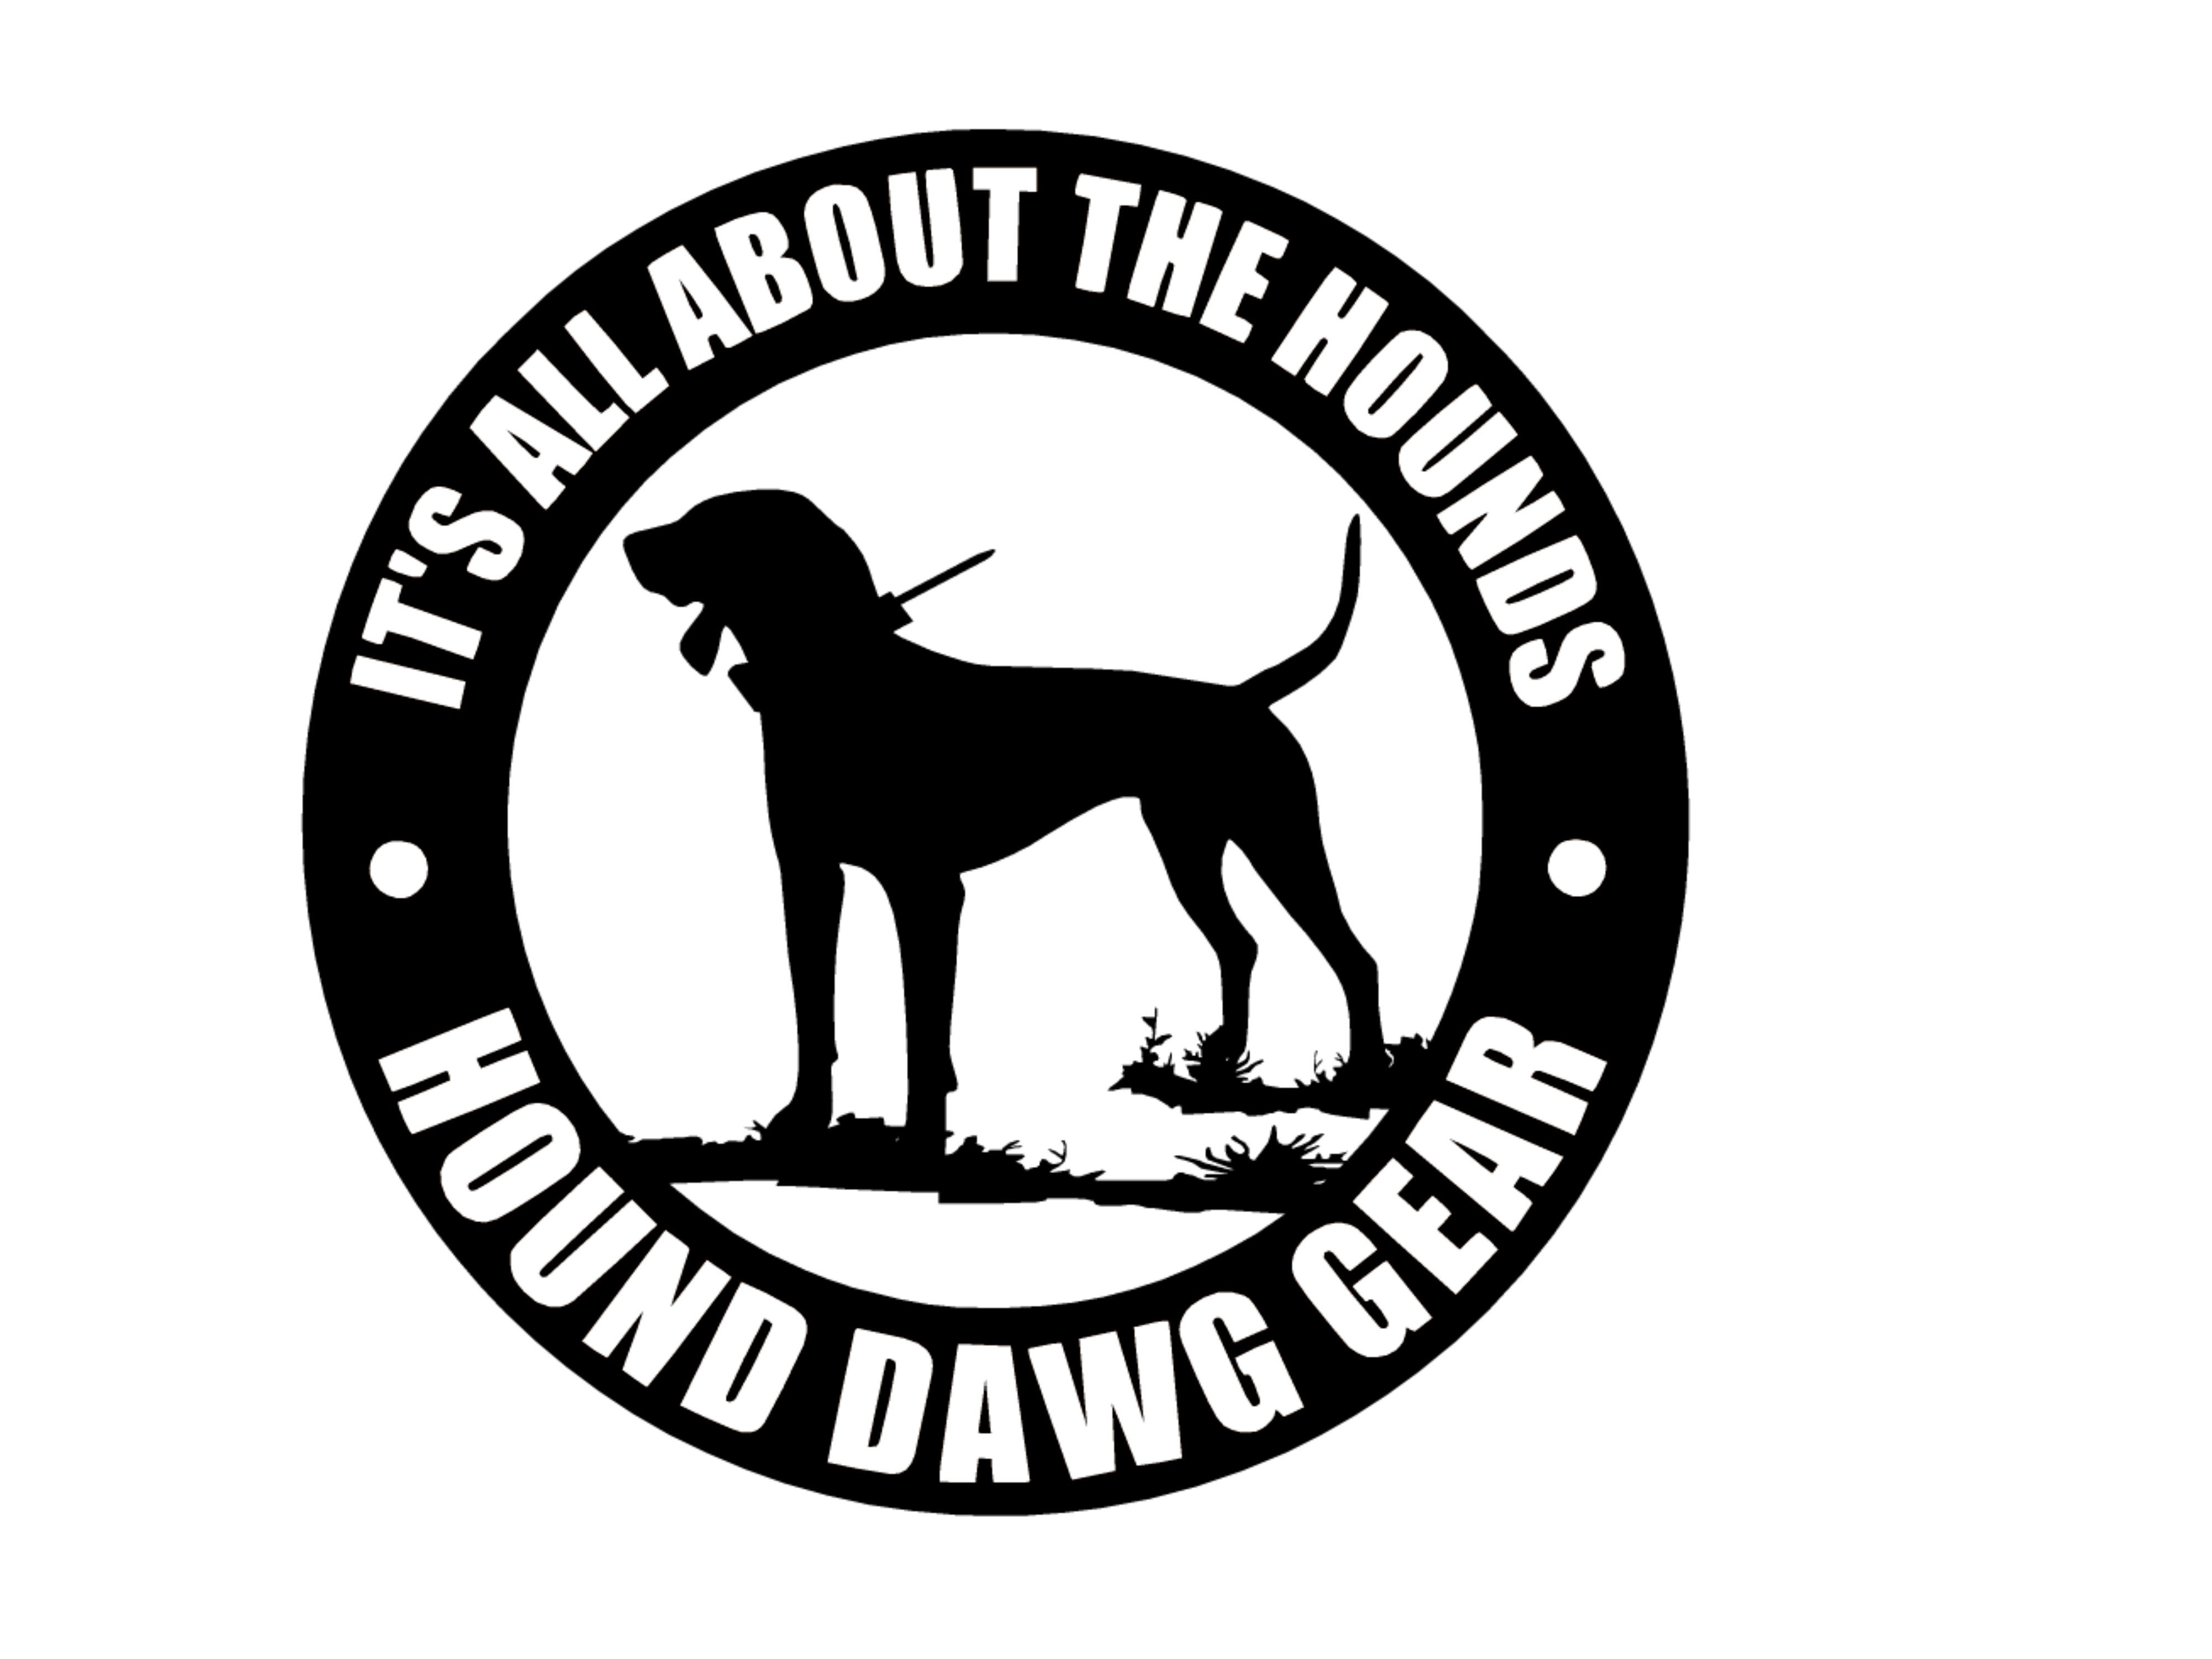 HOUNDDAWGGEAR ByHLG - Sporting dog decals